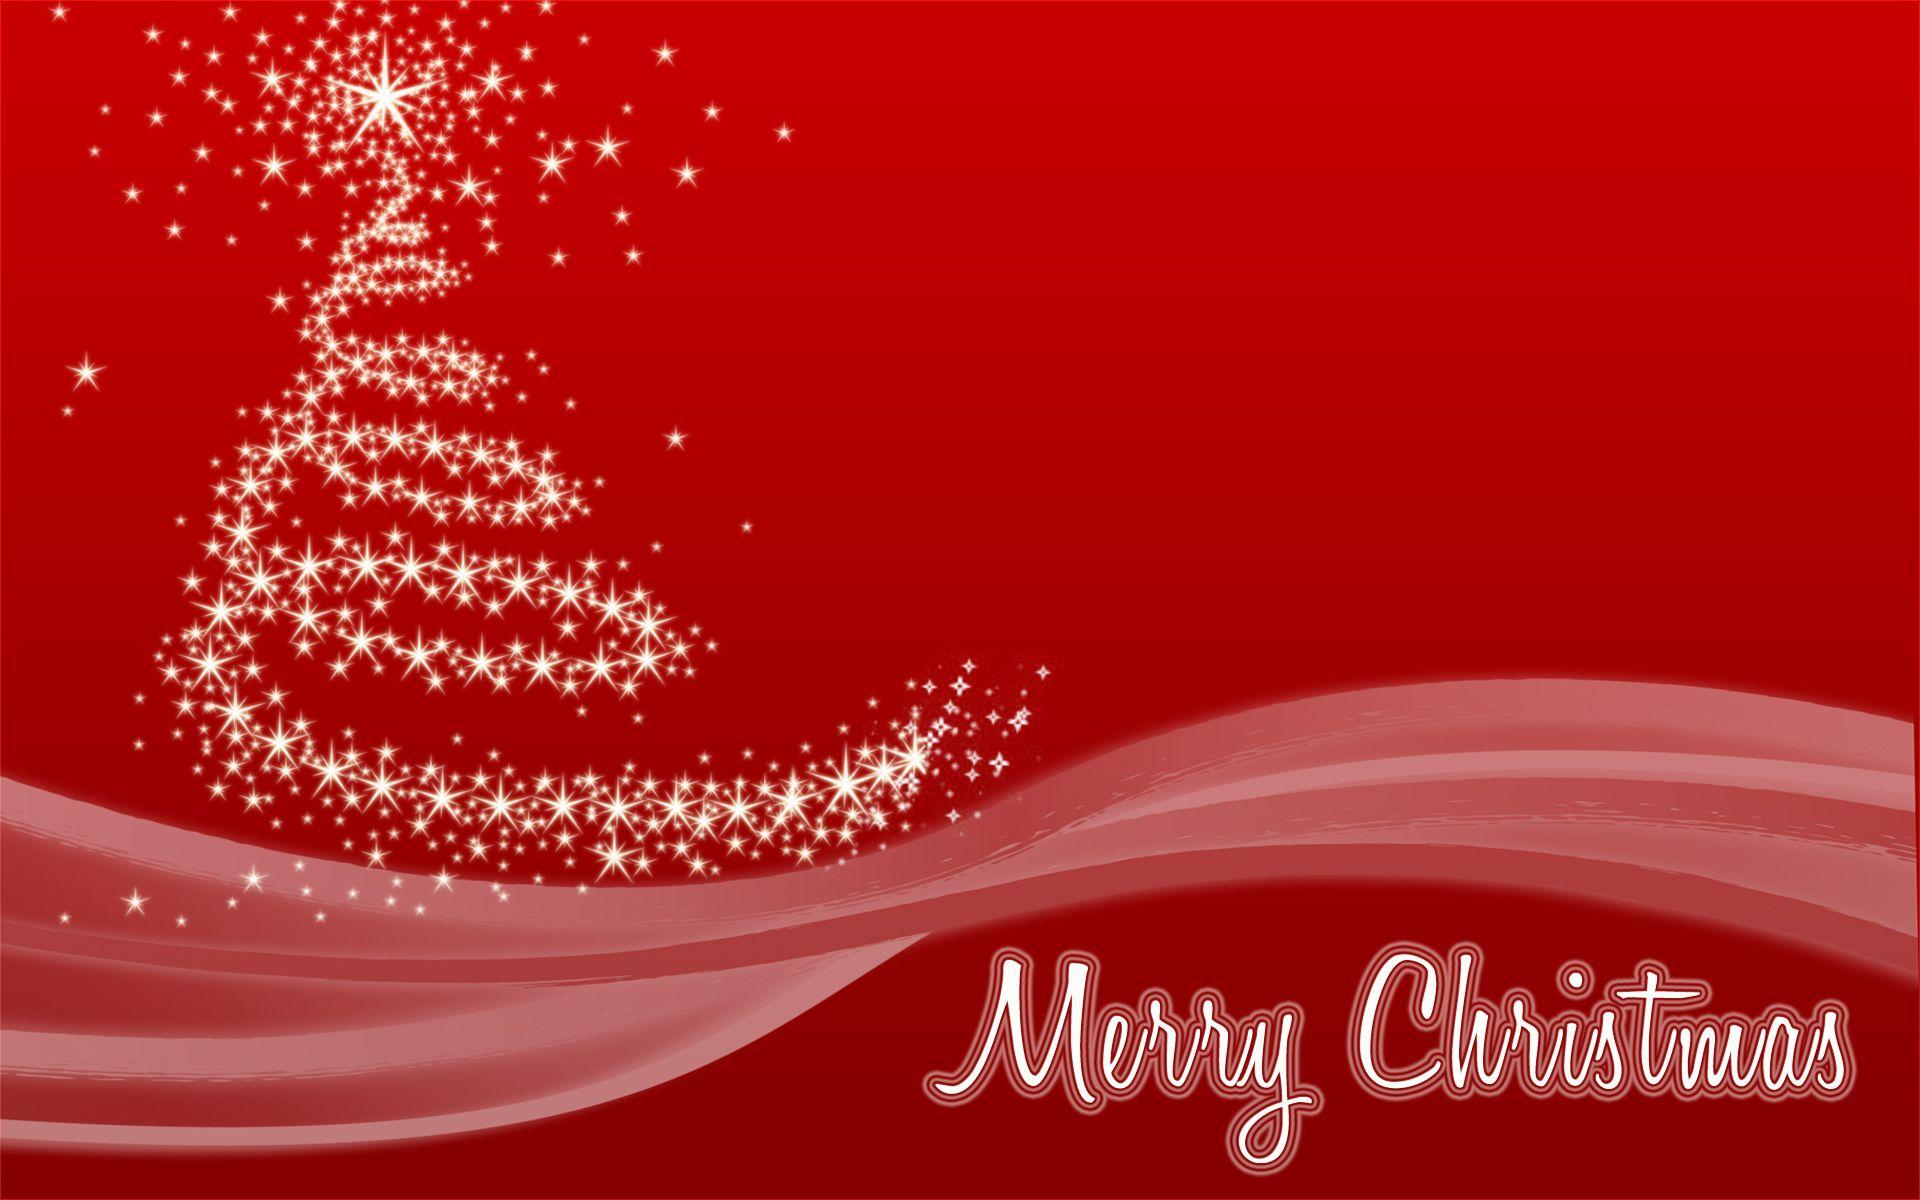 Merry Christmas tree free download wallpaper 2015 HD